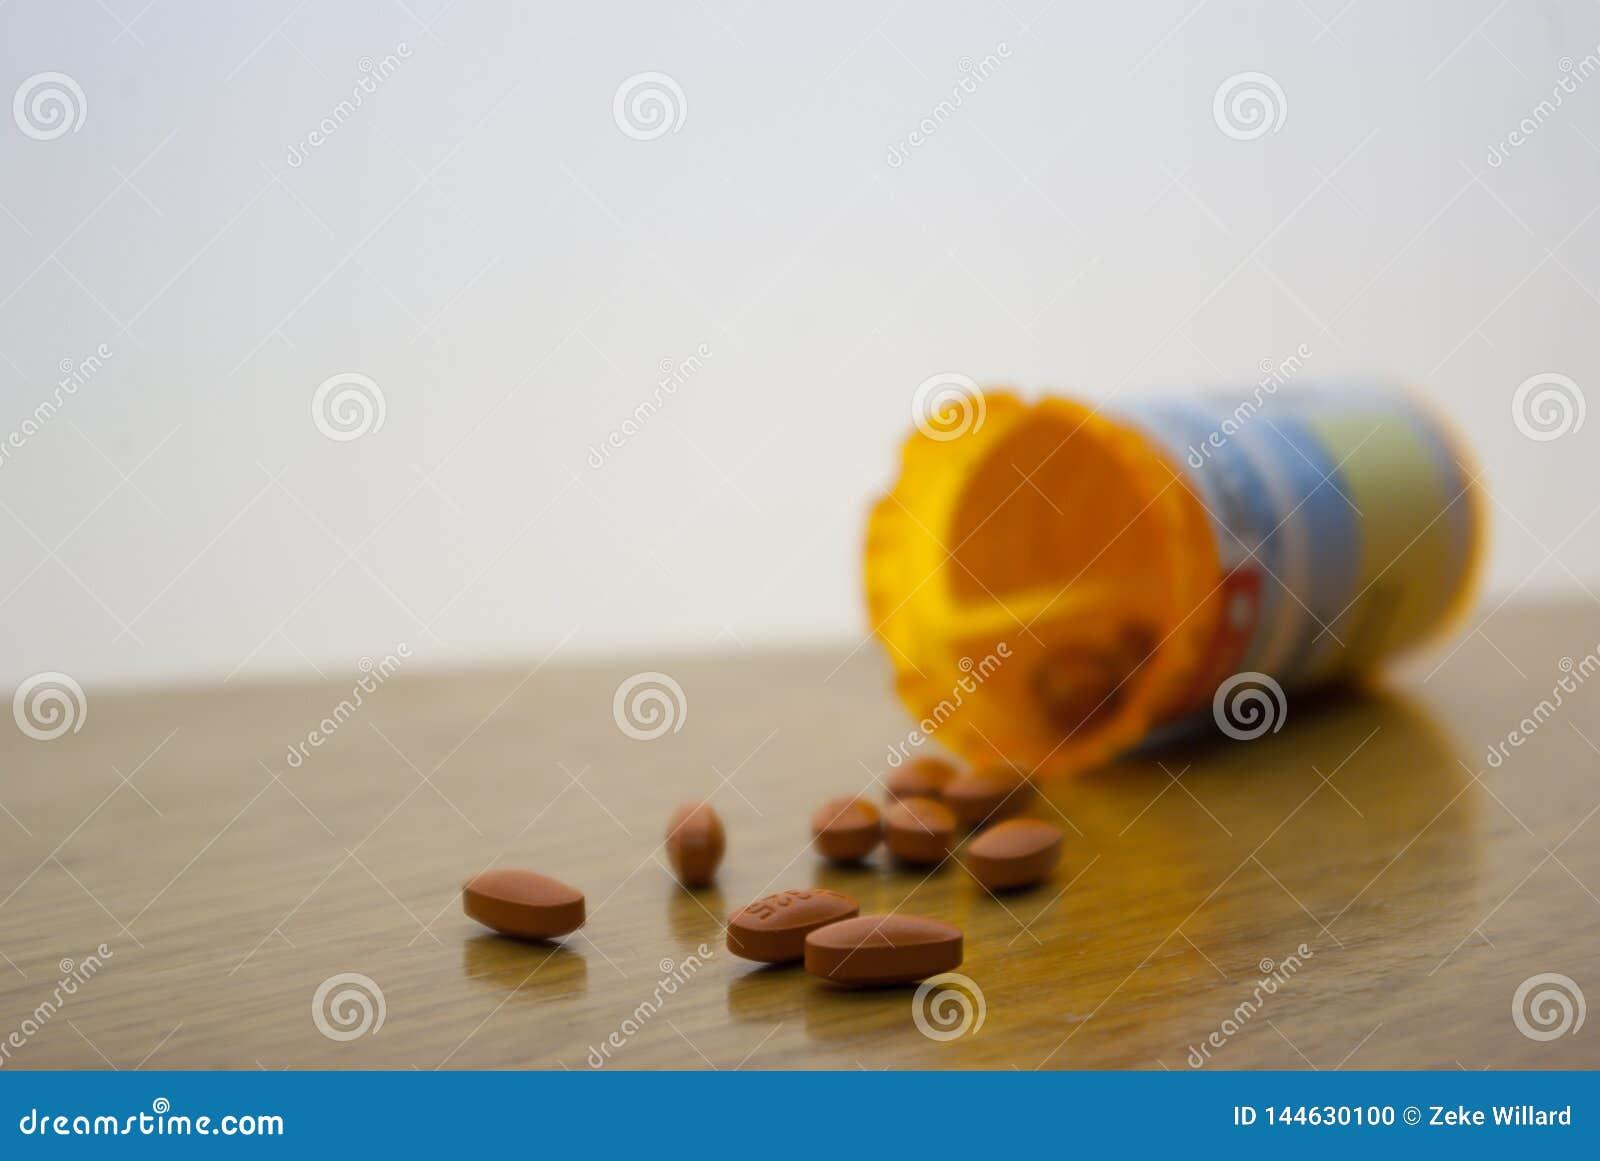 Pillole arancio rovesciate su superficie bianca